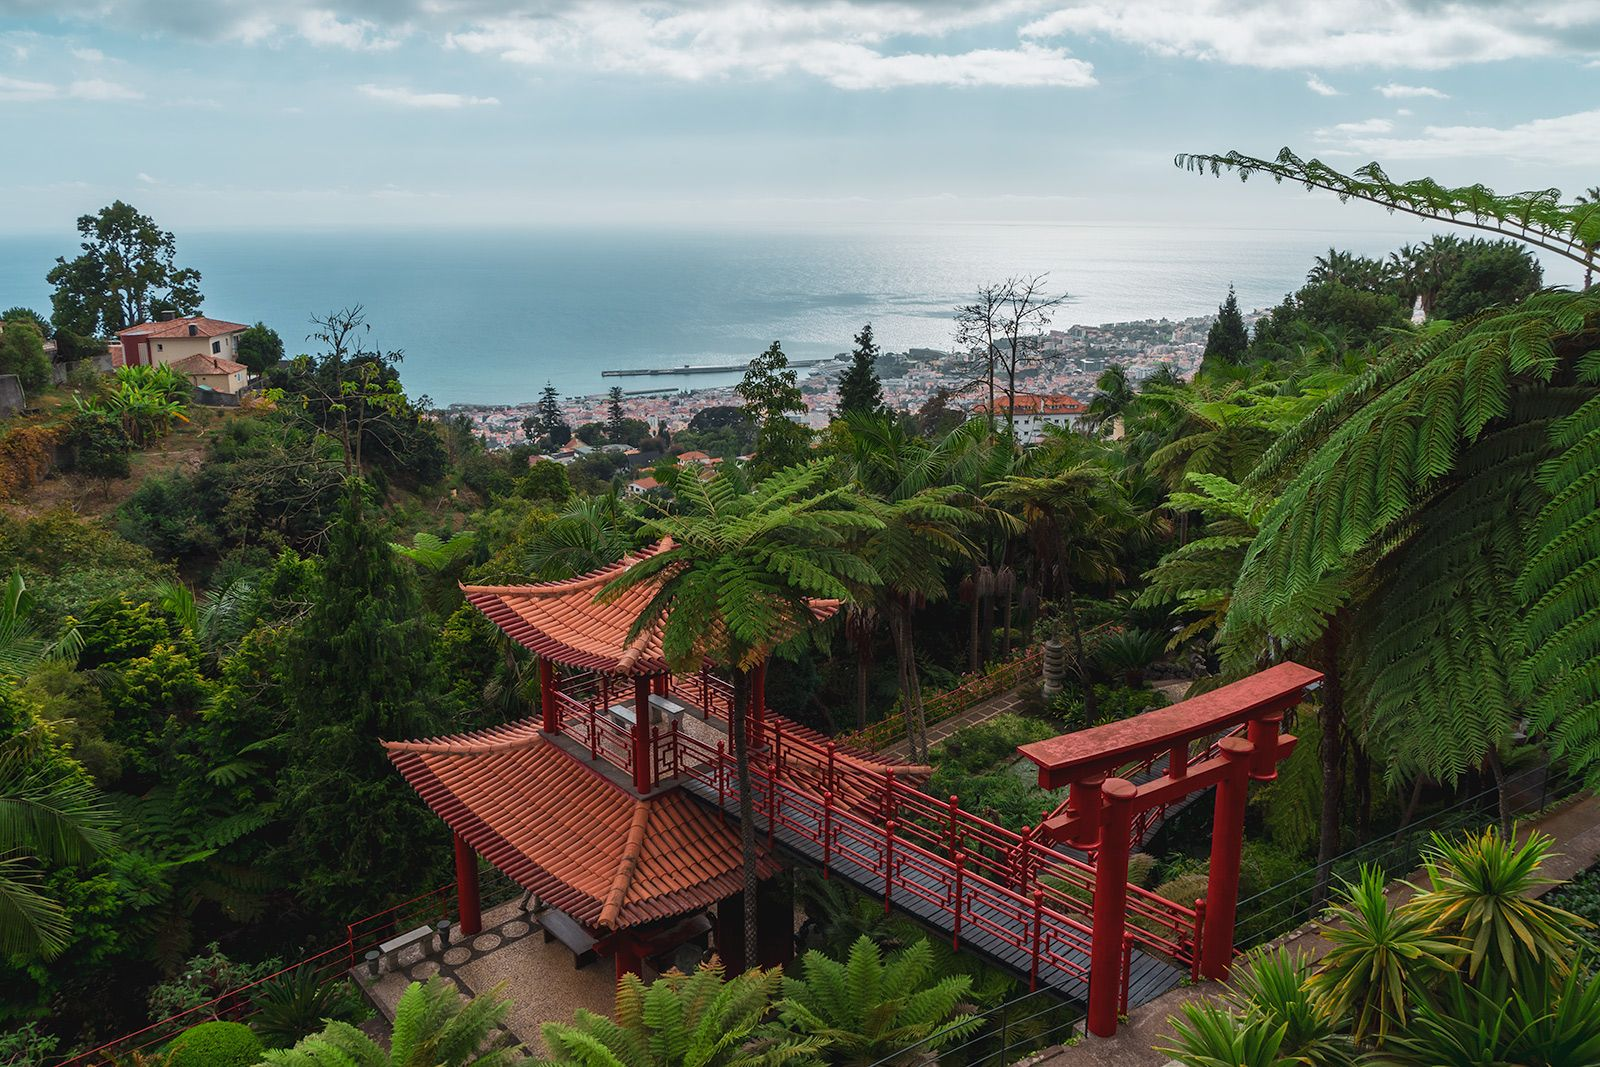 b2b911362f3332951733cd5395dbd6aa - Hotel Ocean Gardens Portugal Madeira Funchal